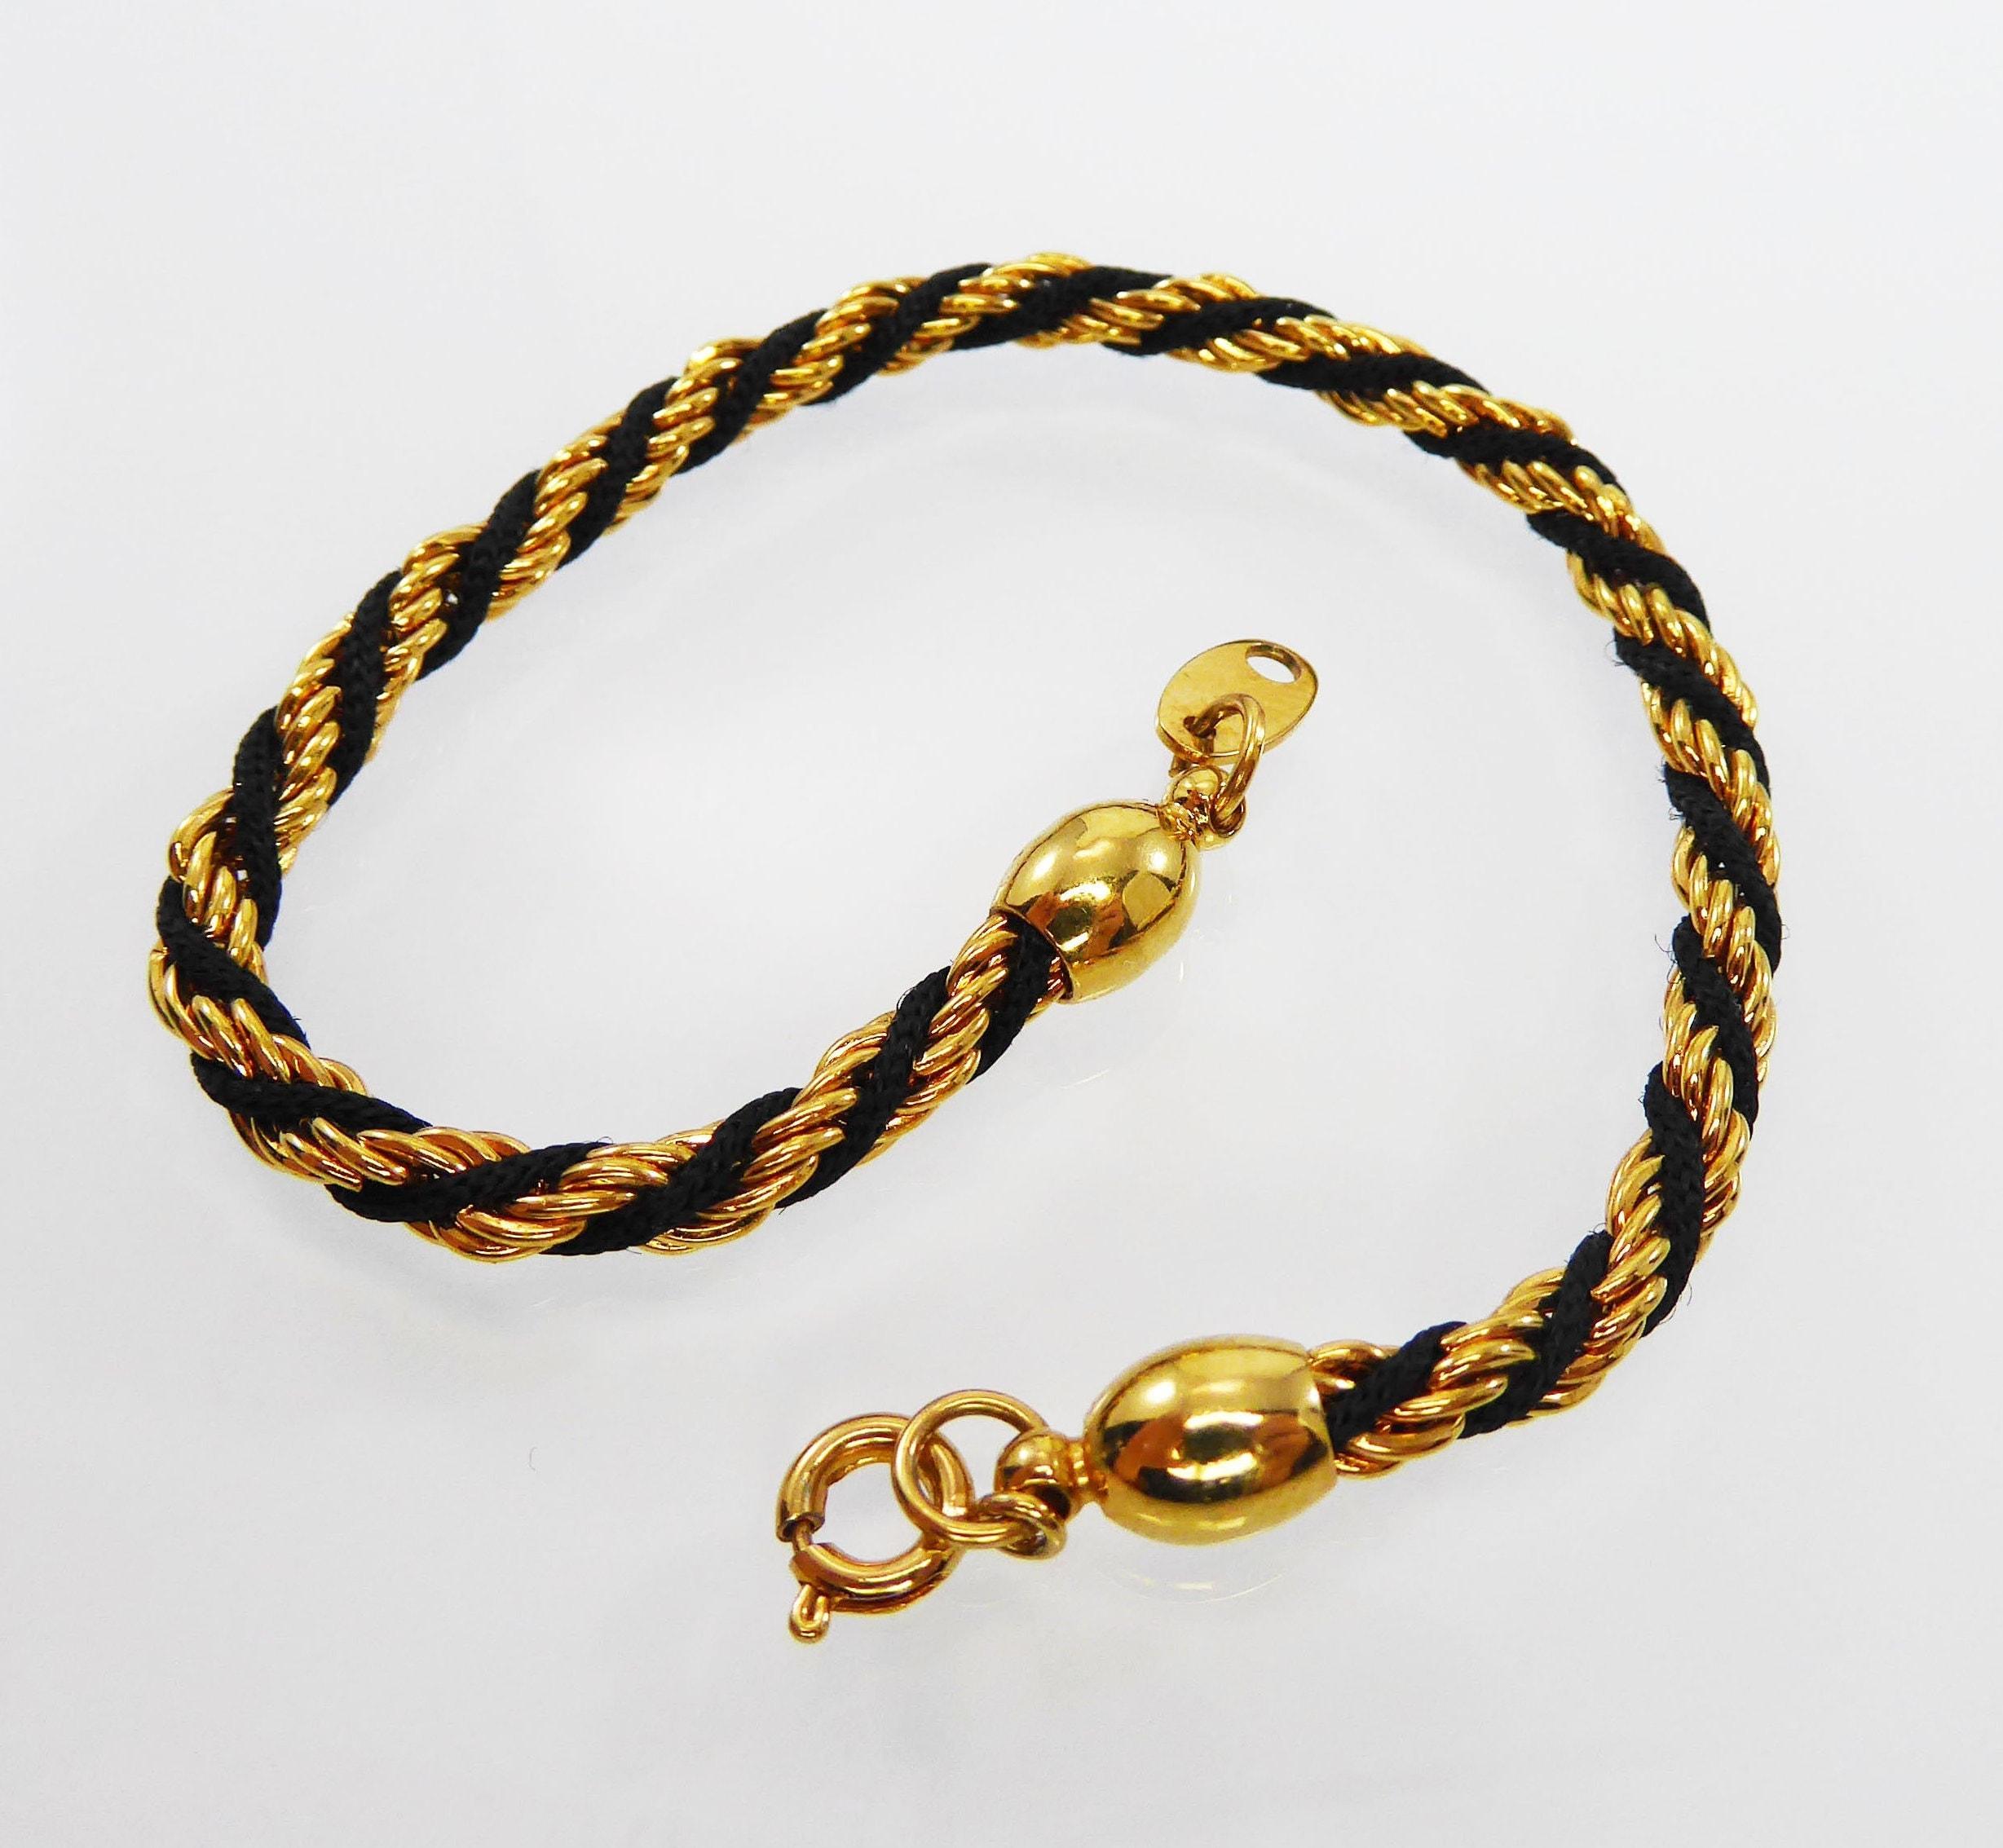 7167ce5f0cdbe Trifari Striped Rope Bracelet Signed Trifari Twisted Gold Tone and ...